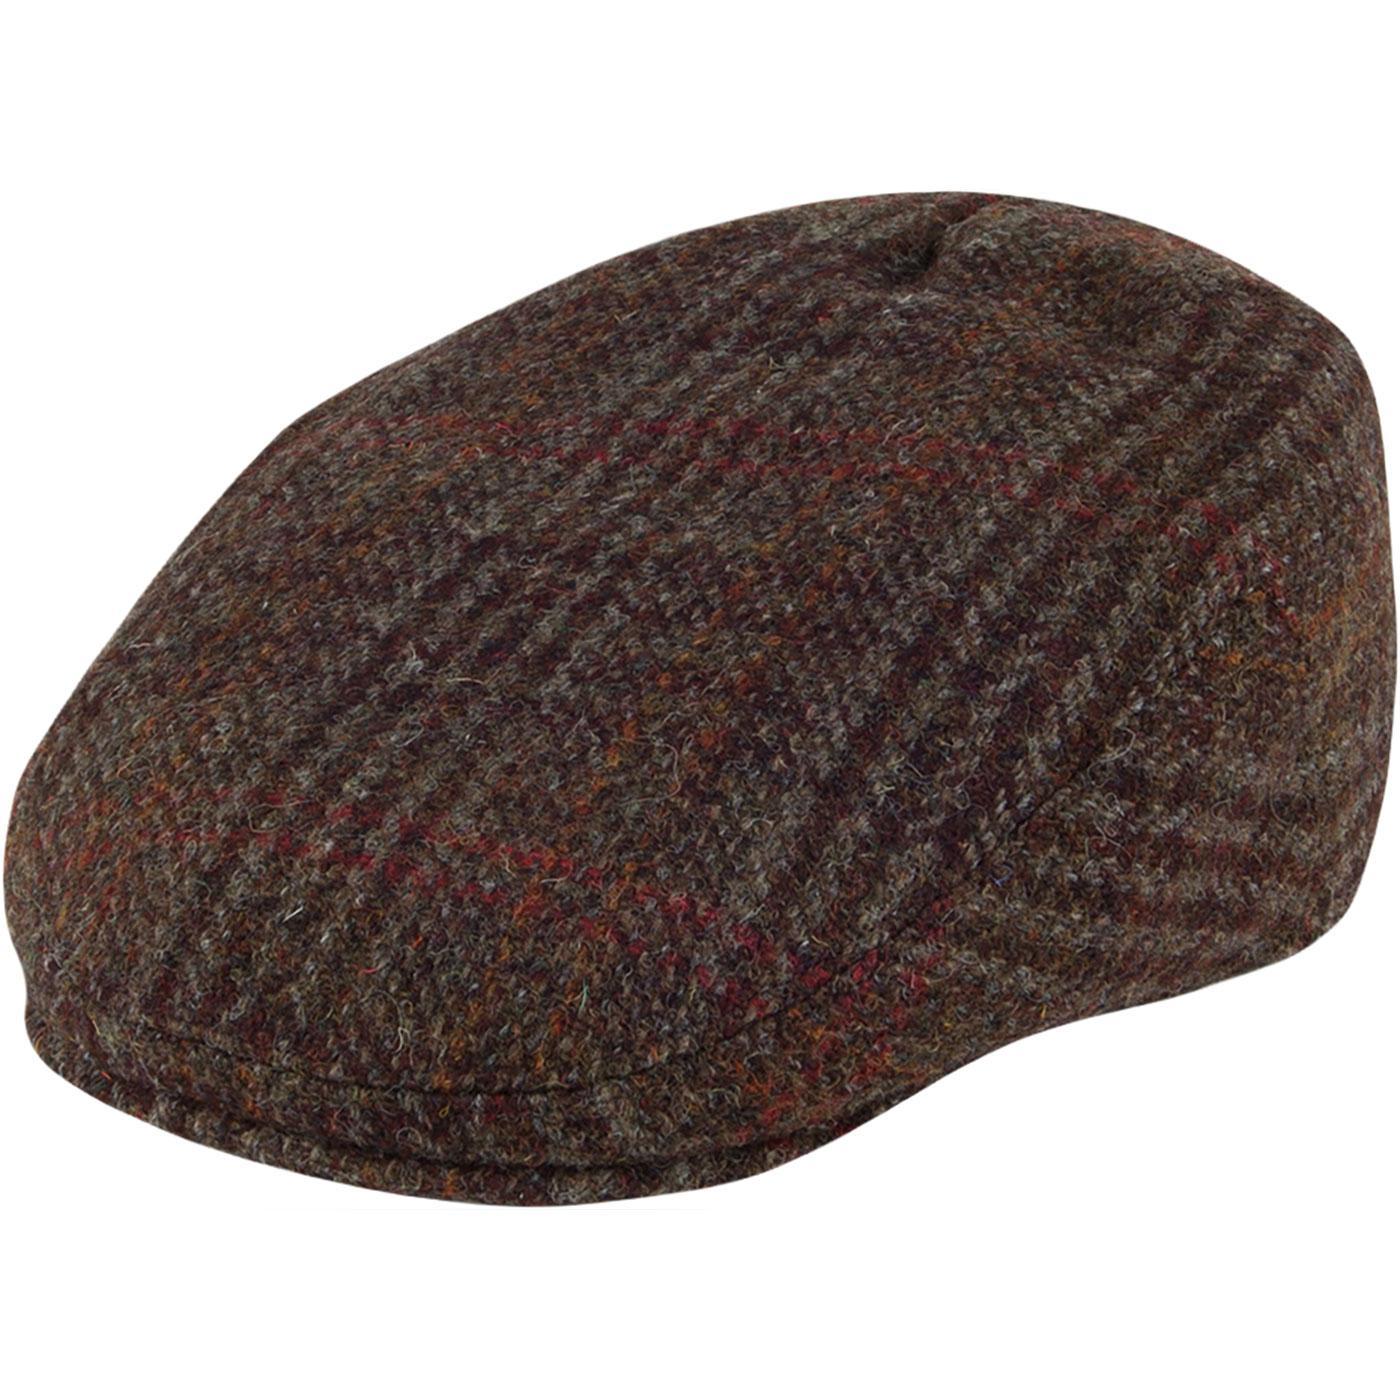 FAILSWORTH Stornoway Harris Tweed Flat Cap - GREY